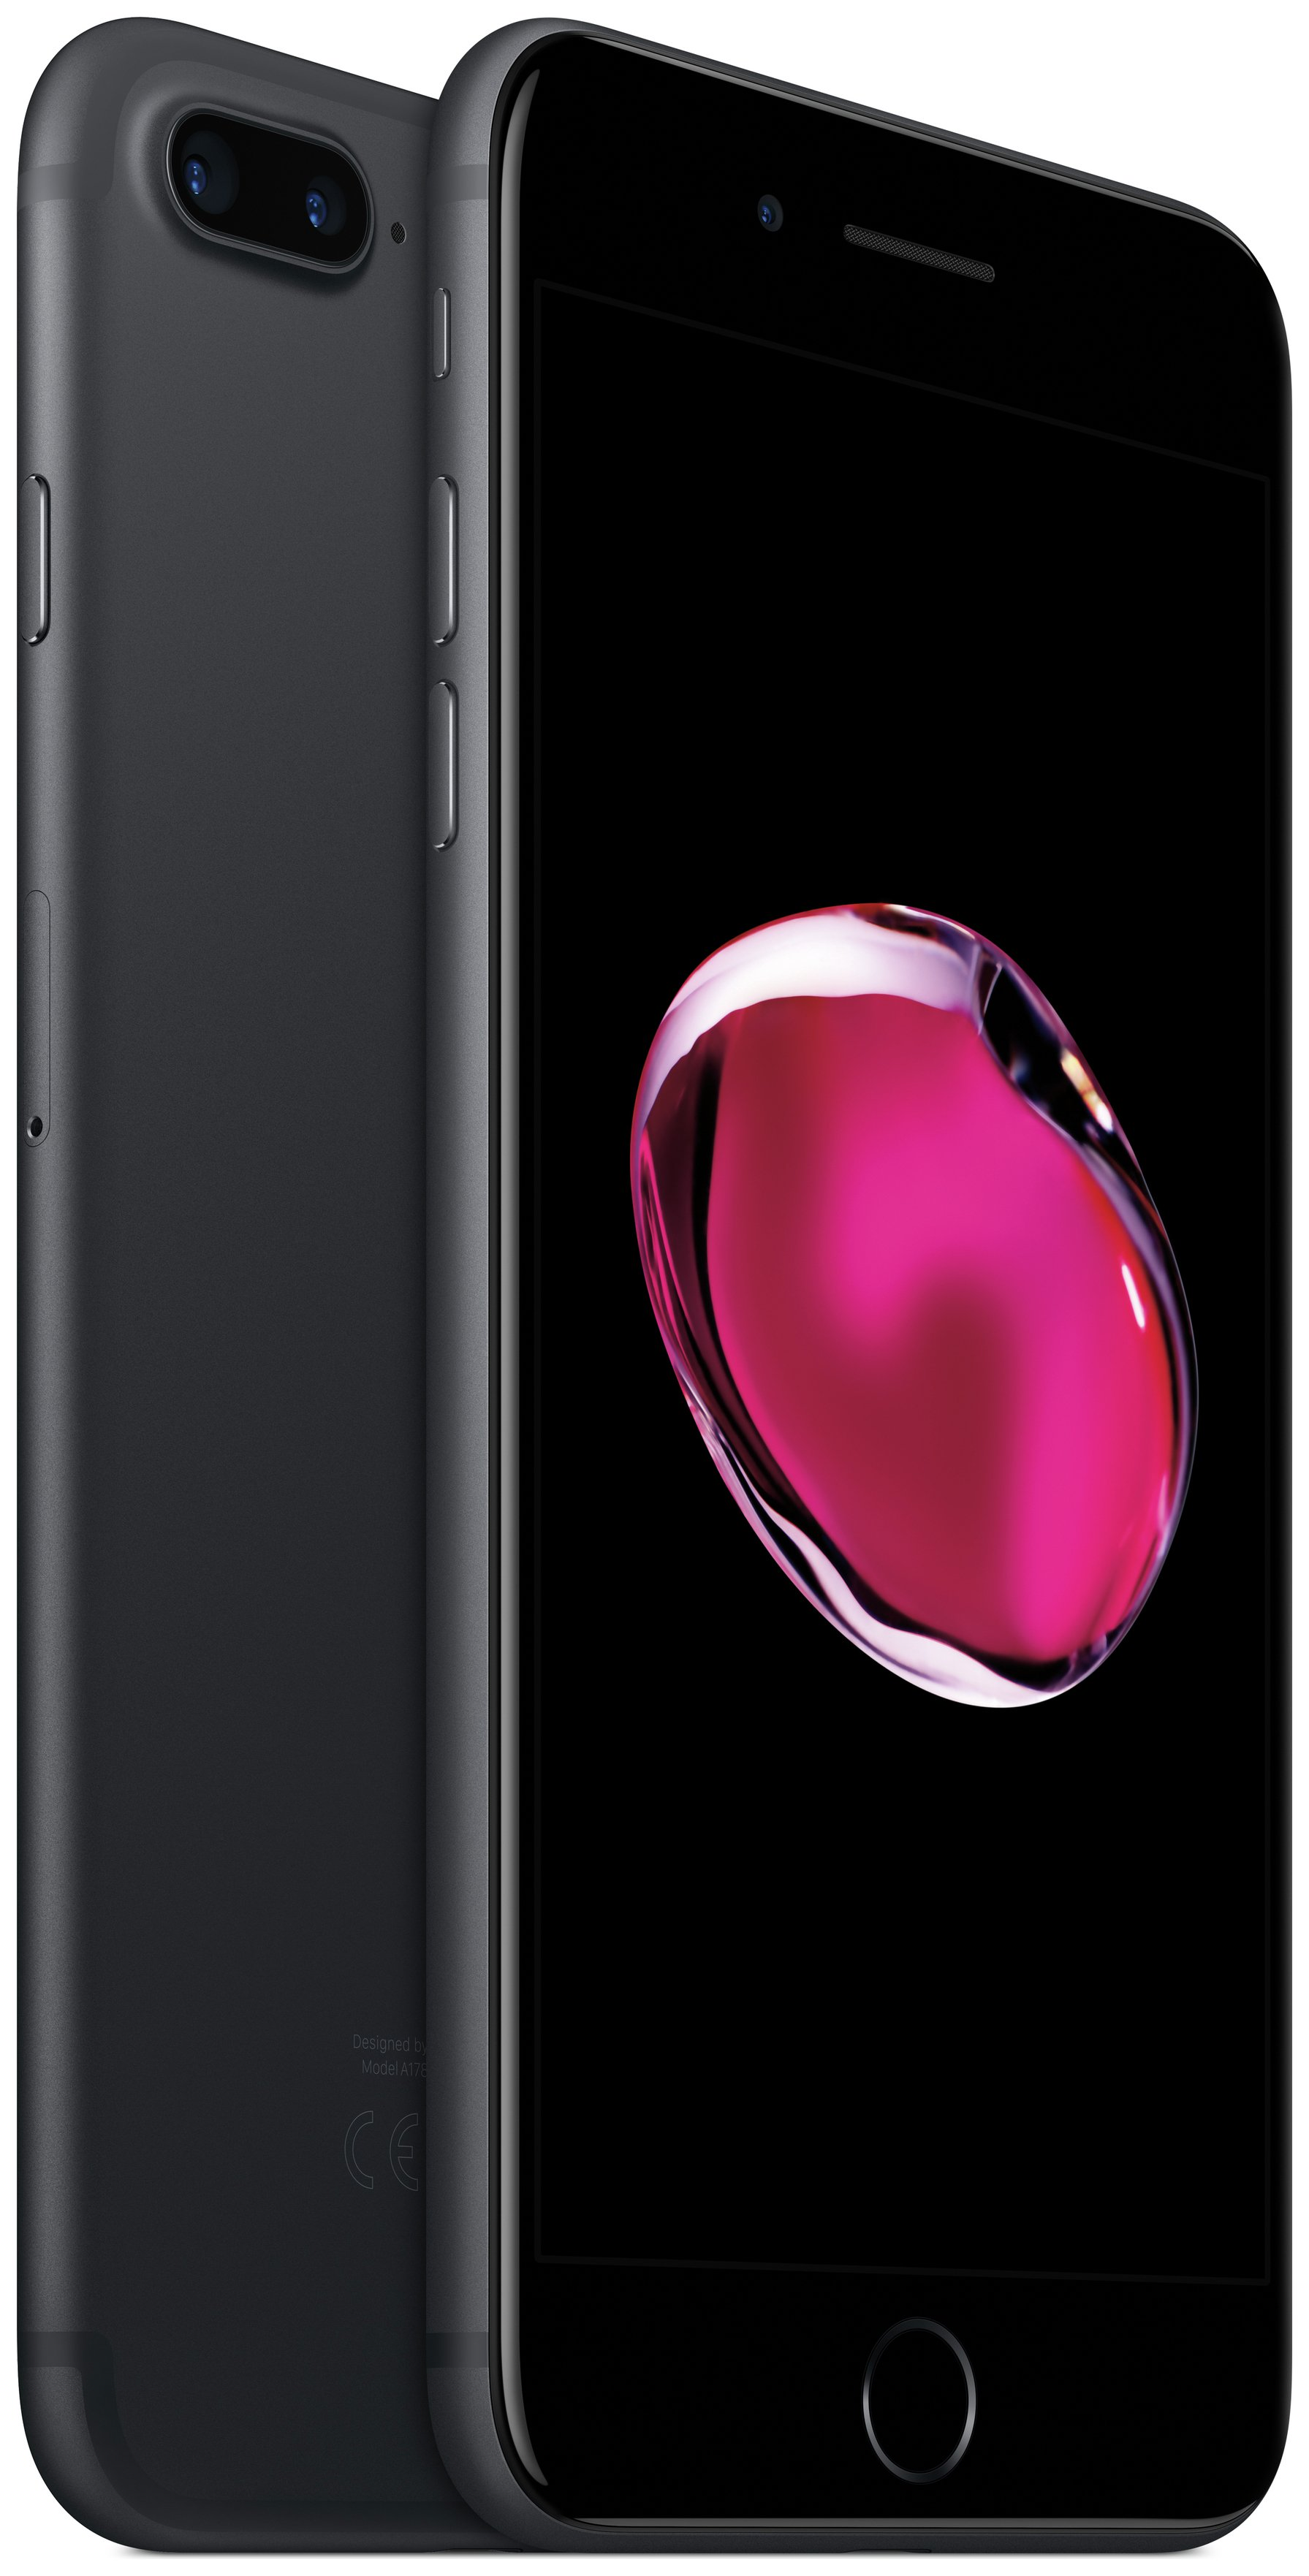 Apple Sim Free iPhone 7 Plus 128GB Mobile Phone - Black.